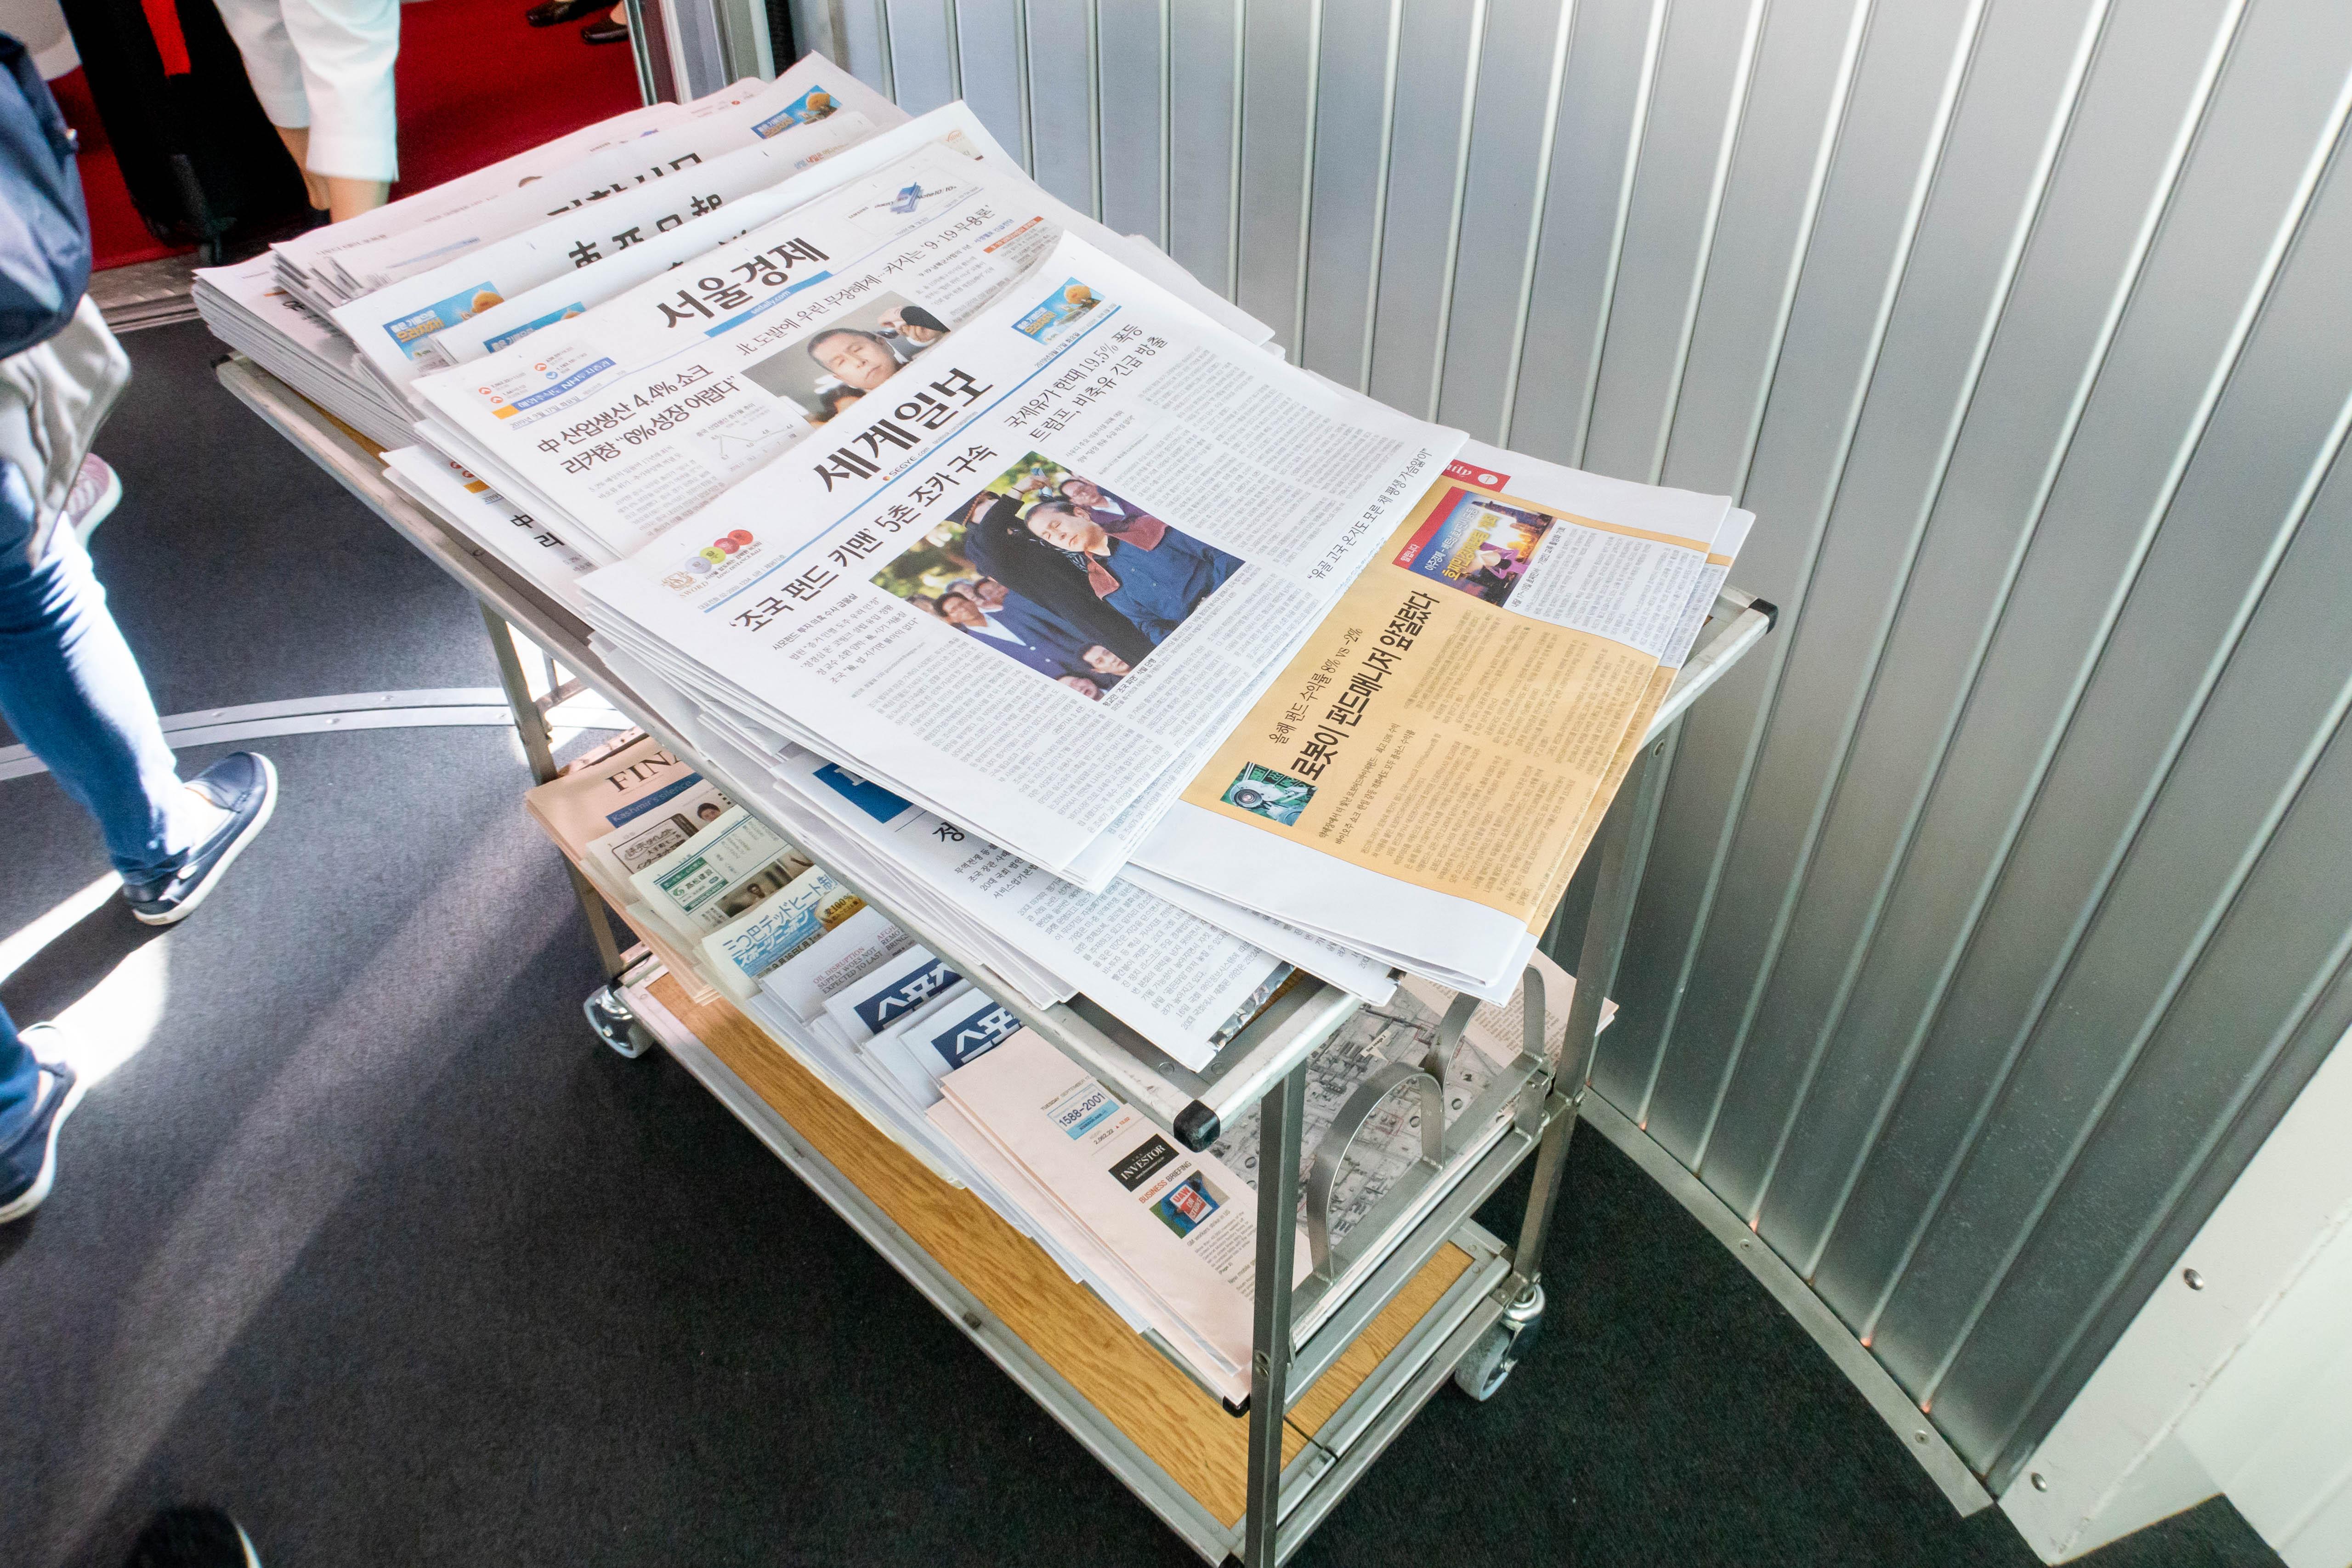 Korean Air Newspapers